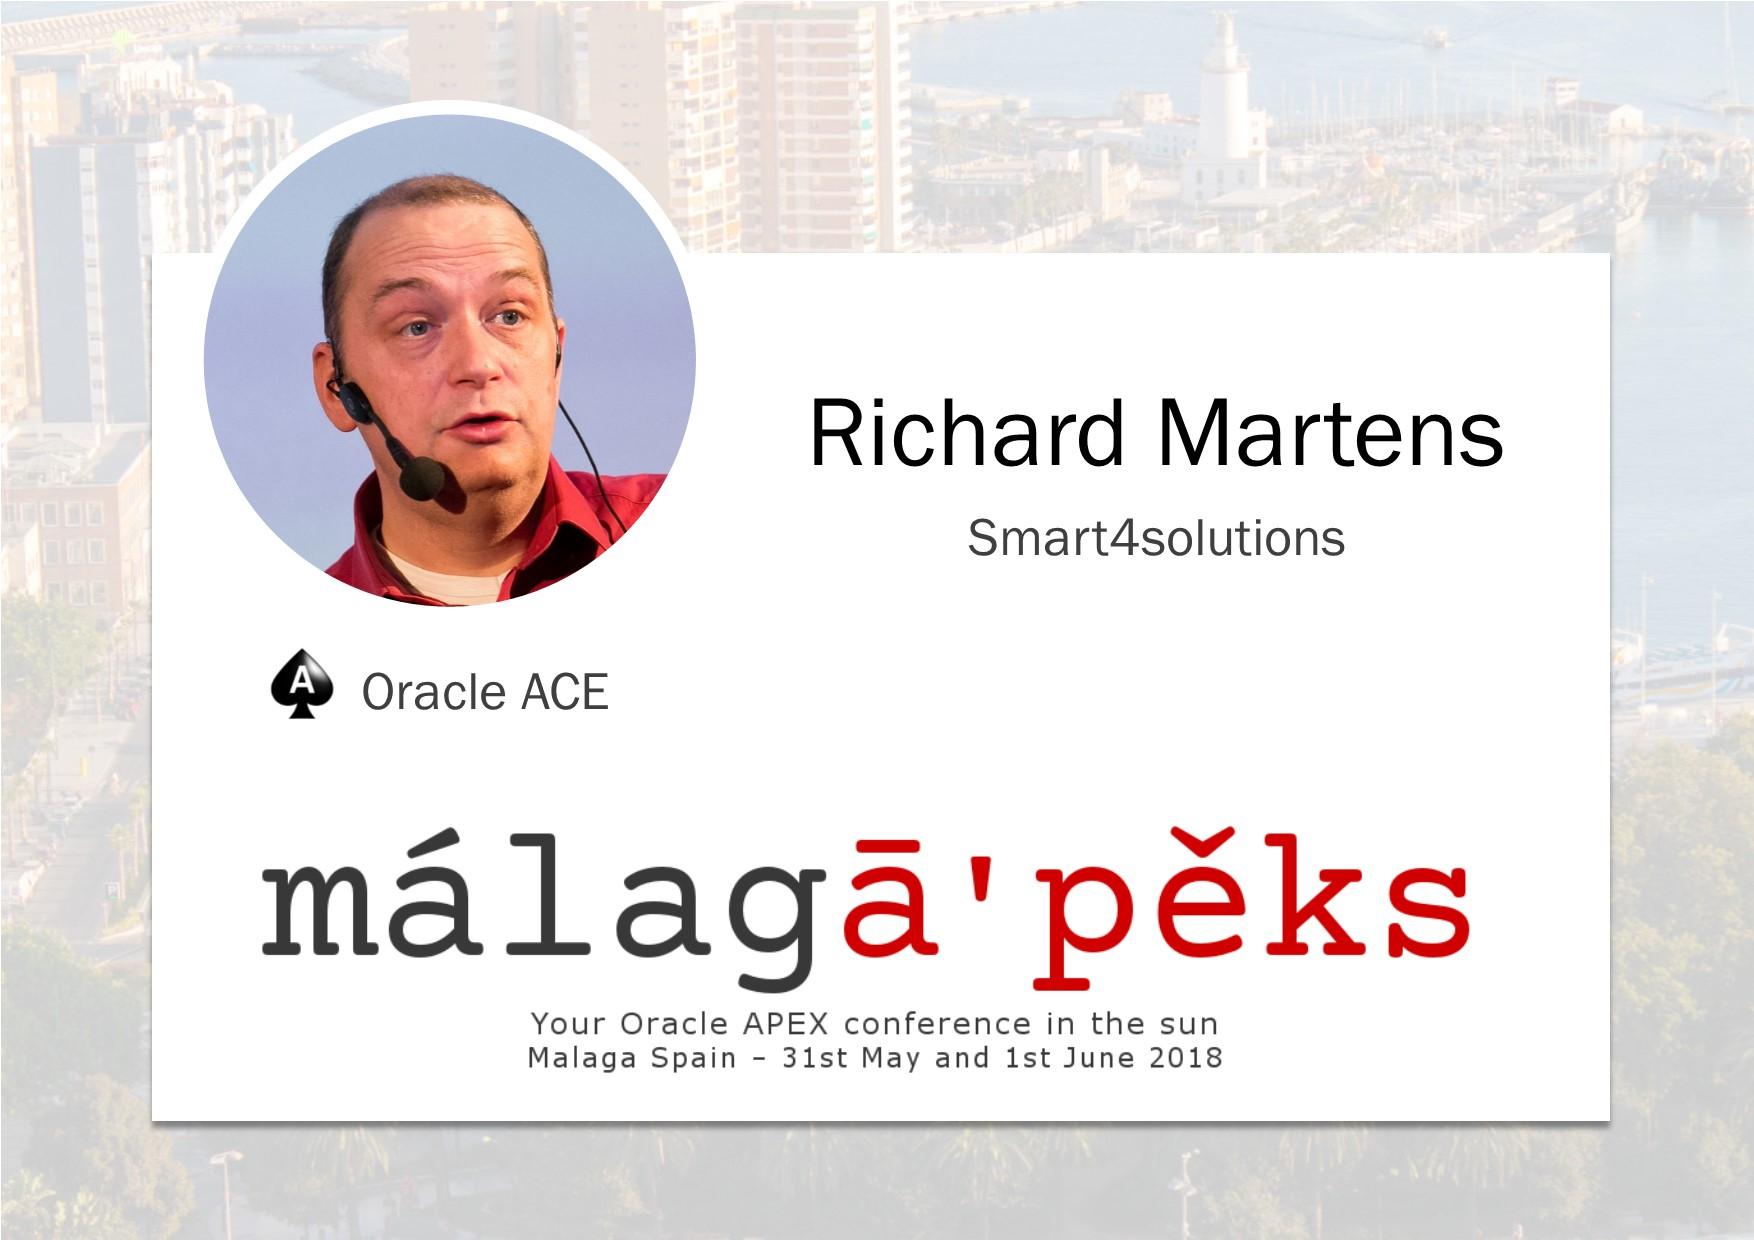 malagapex - richard martens